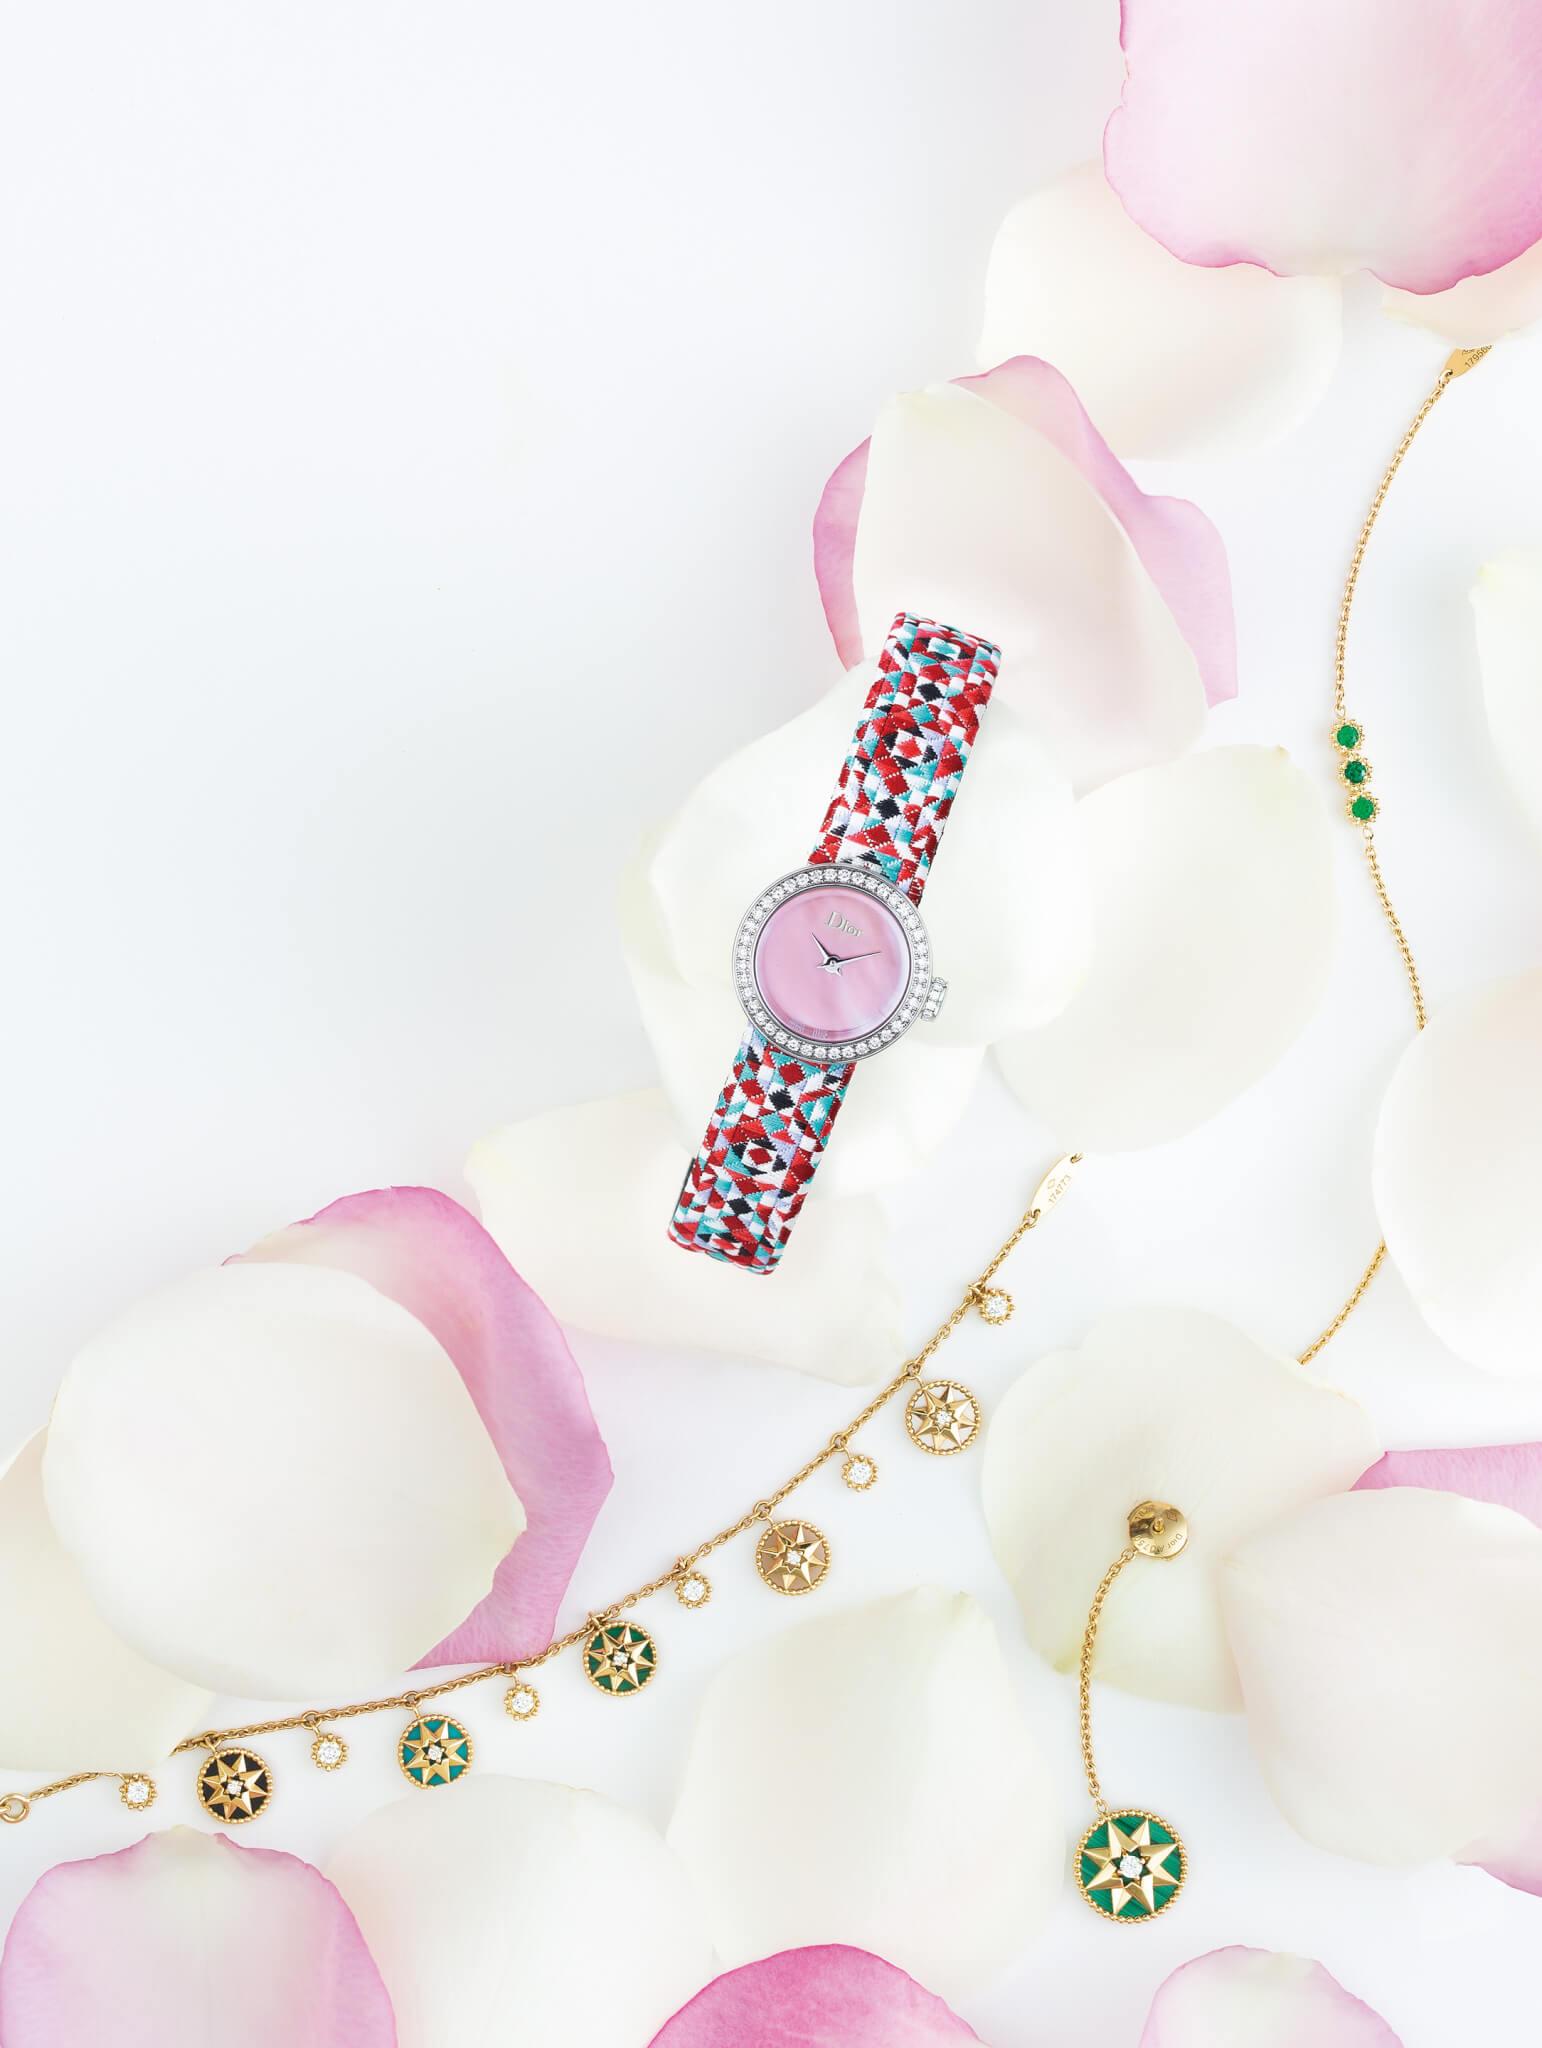 La Mini D de Dior Mosaique 19mm精鋼、鑽石及珍珠母貝腕錶,搭載石英機芯,配編織錶帶 $34,200 Dior Joaillerie Mimirose 18K黃金及祖母綠手鏈 $15,400 Dior Joaillerie Rose des Vents 18K黃金、鑽石、珍珠母貝、縞瑪瑙、綠松石、孔雀石及粉紅蛋白石手鏈 $56,000 Dior Joaillerie Rose des Vents 18K黃金、鑽石及孔雀石耳環 $17,800/對